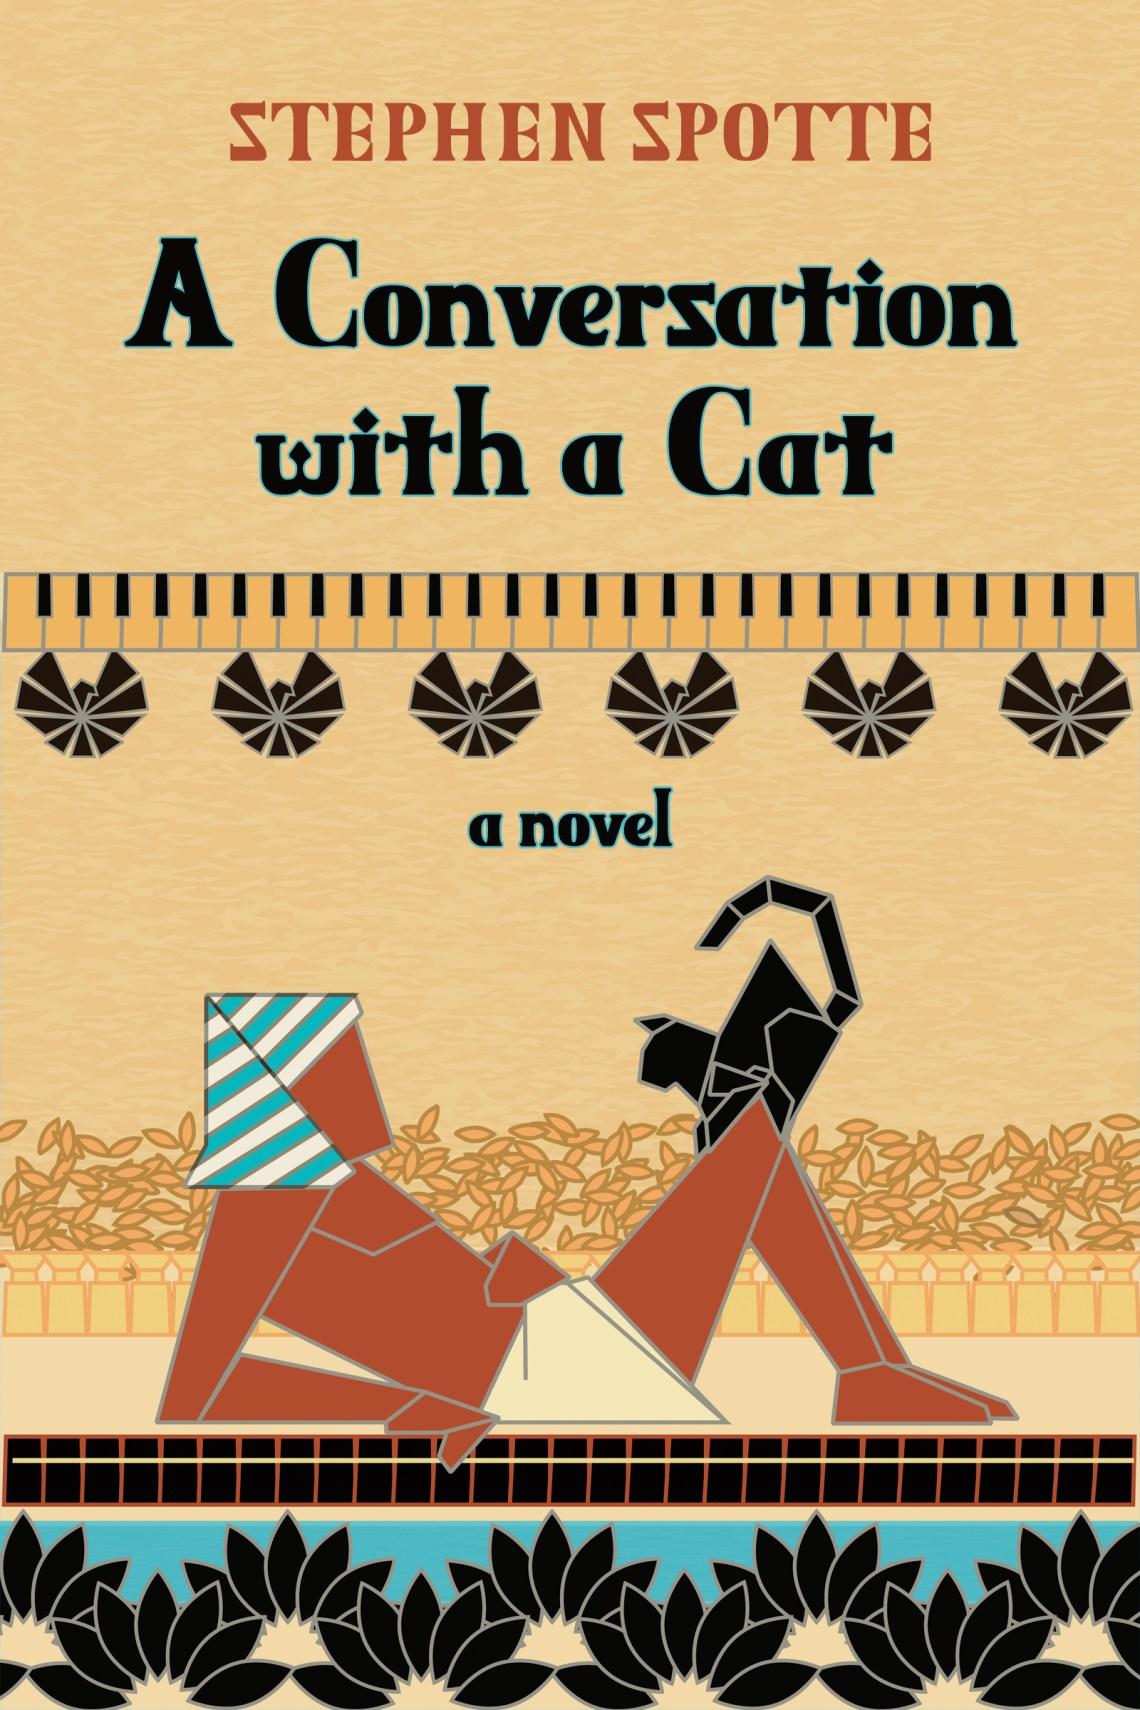 aconversationwithacatcover